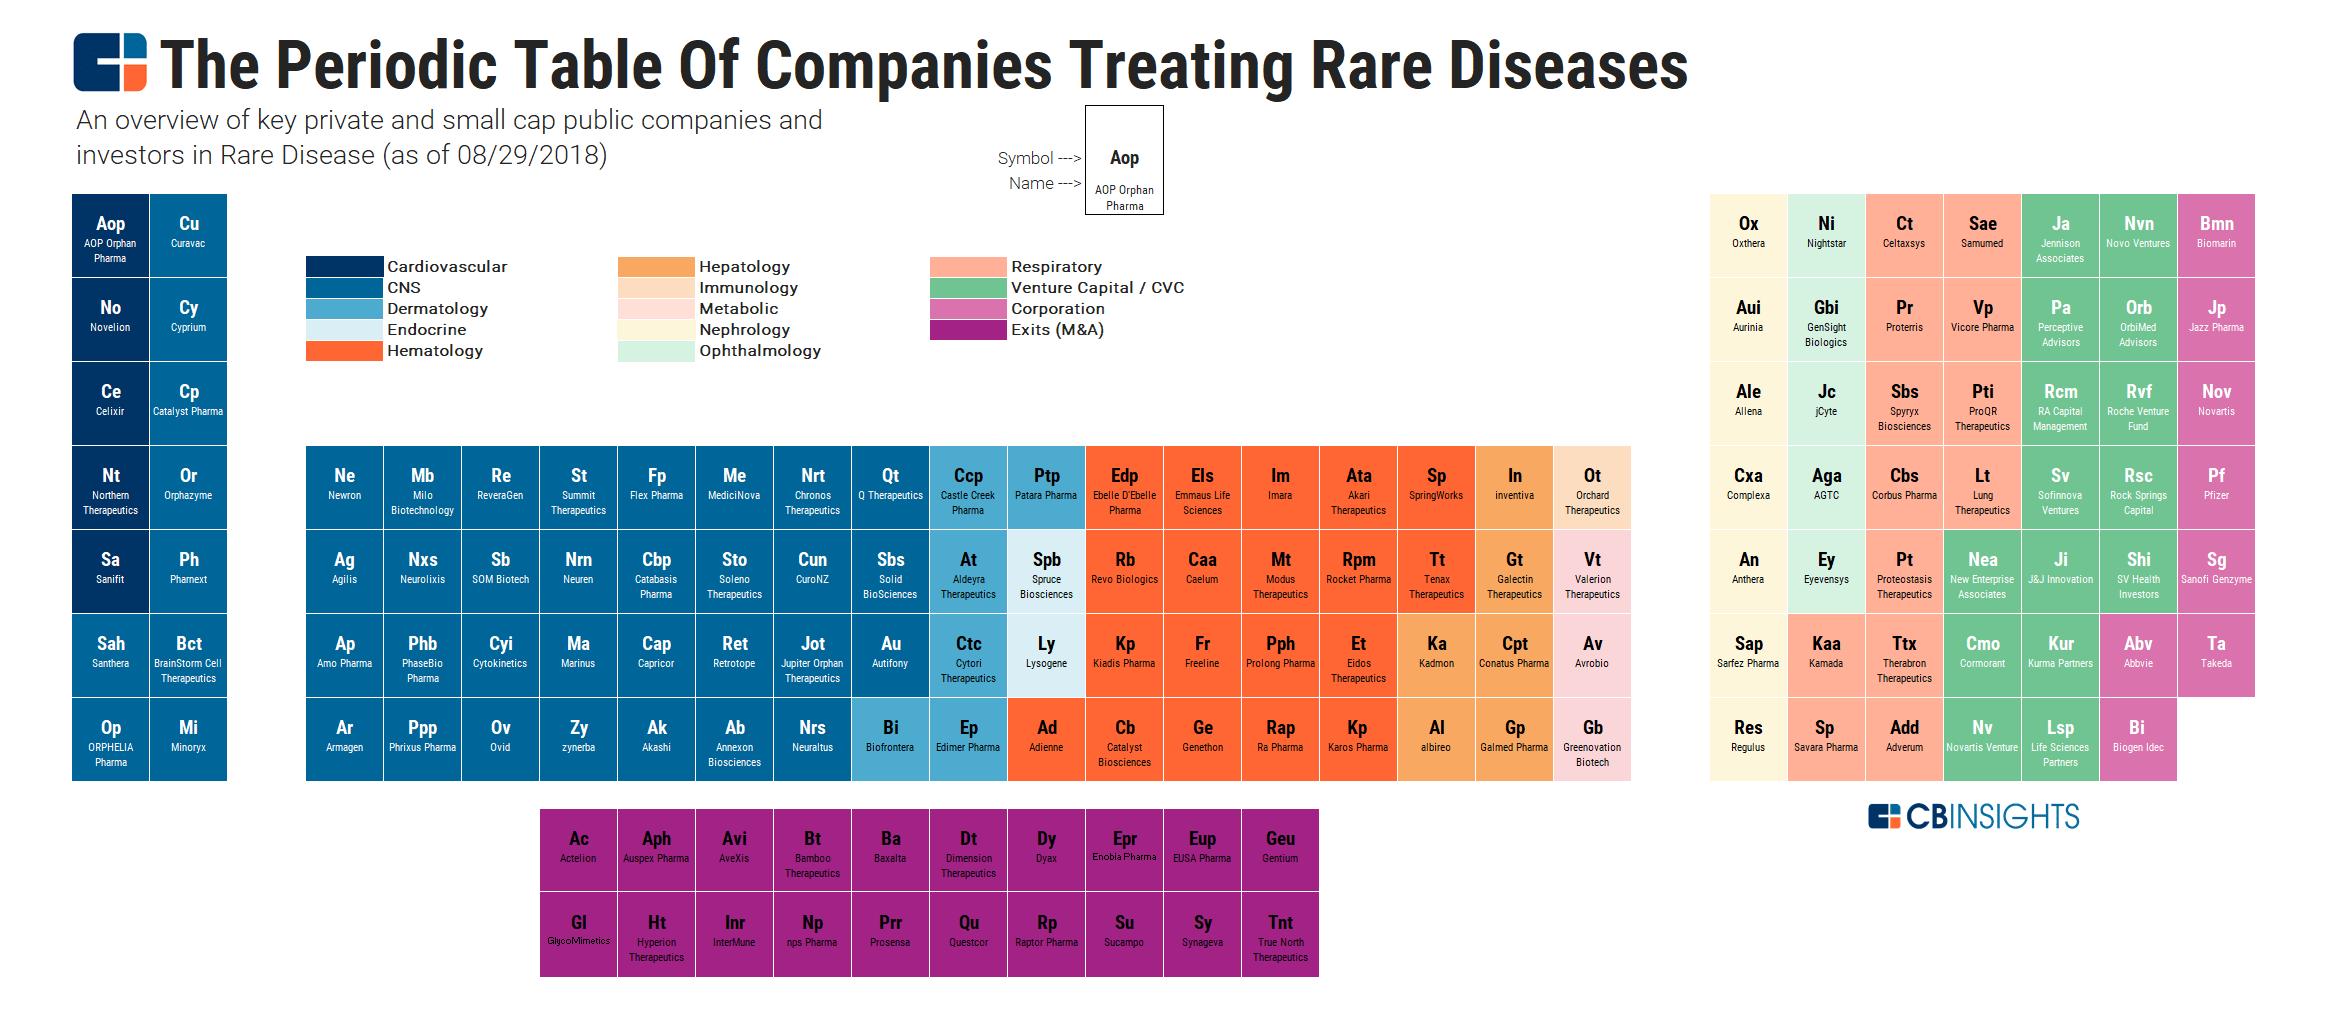 Periodic Table Of Rare Disease Treatment: 100+ Companies